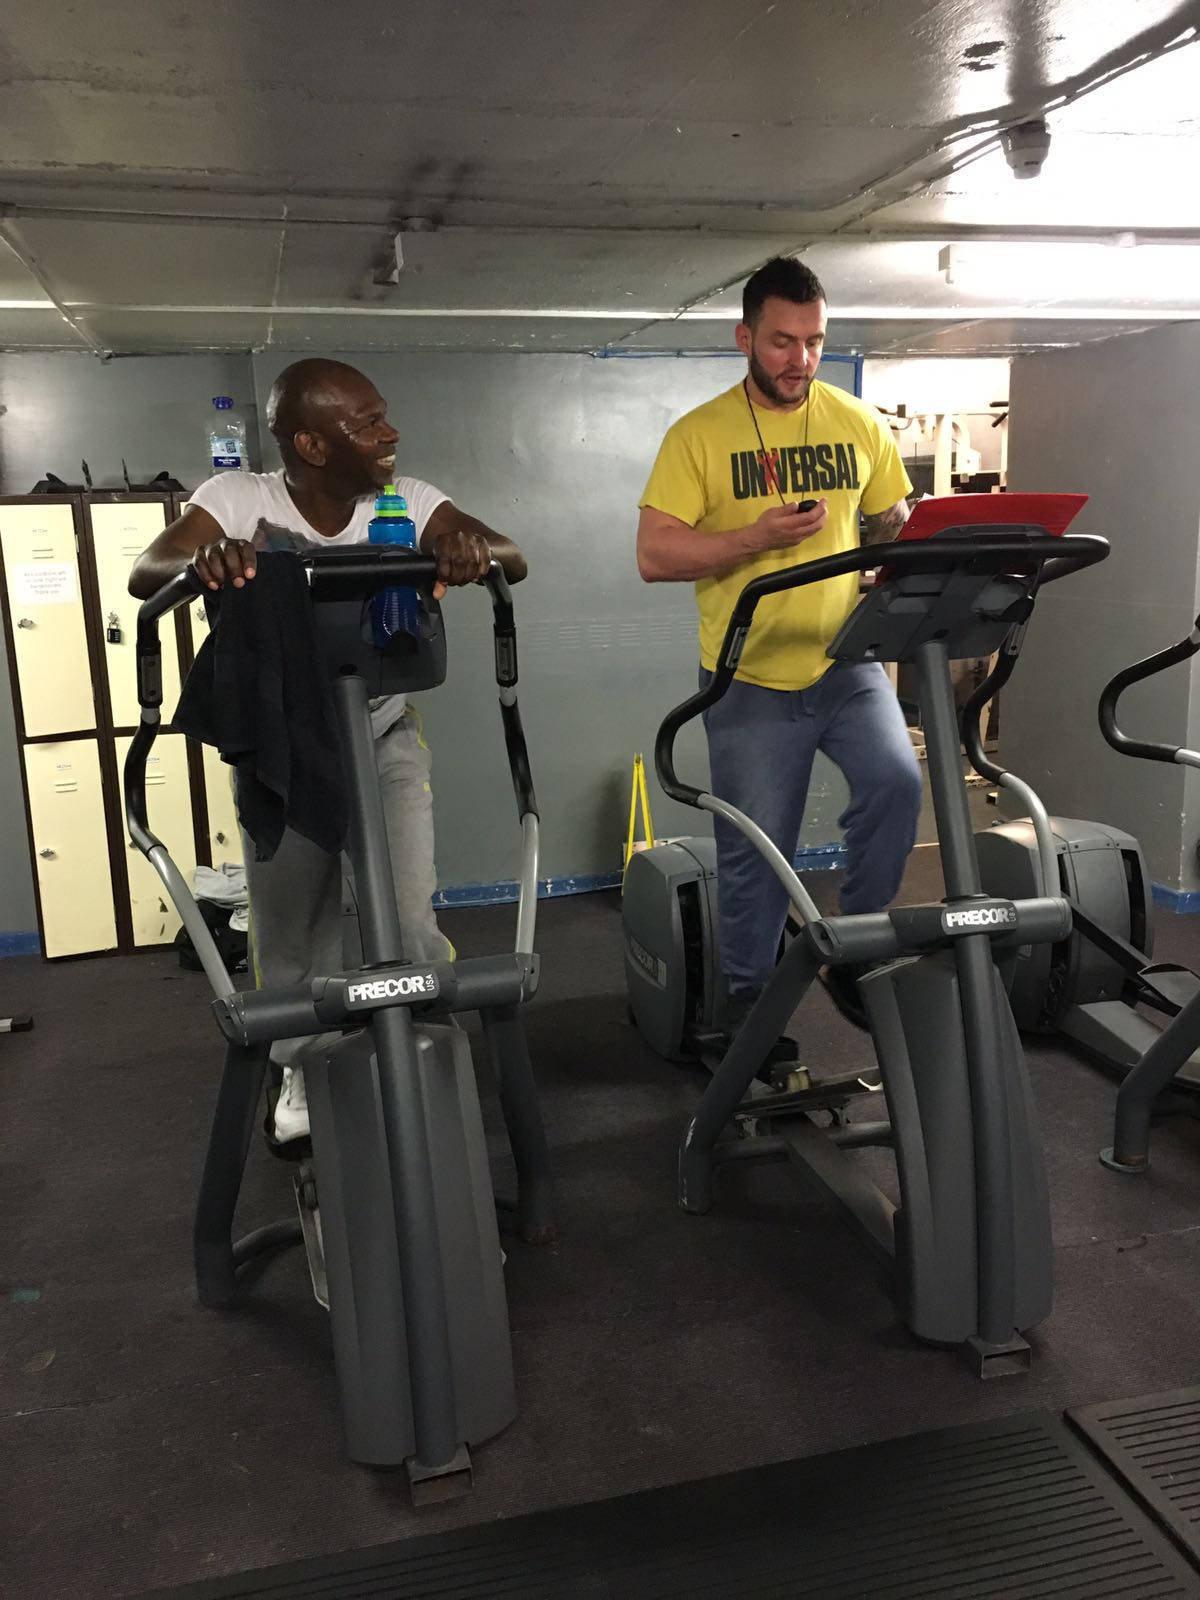 1:1 Gym session